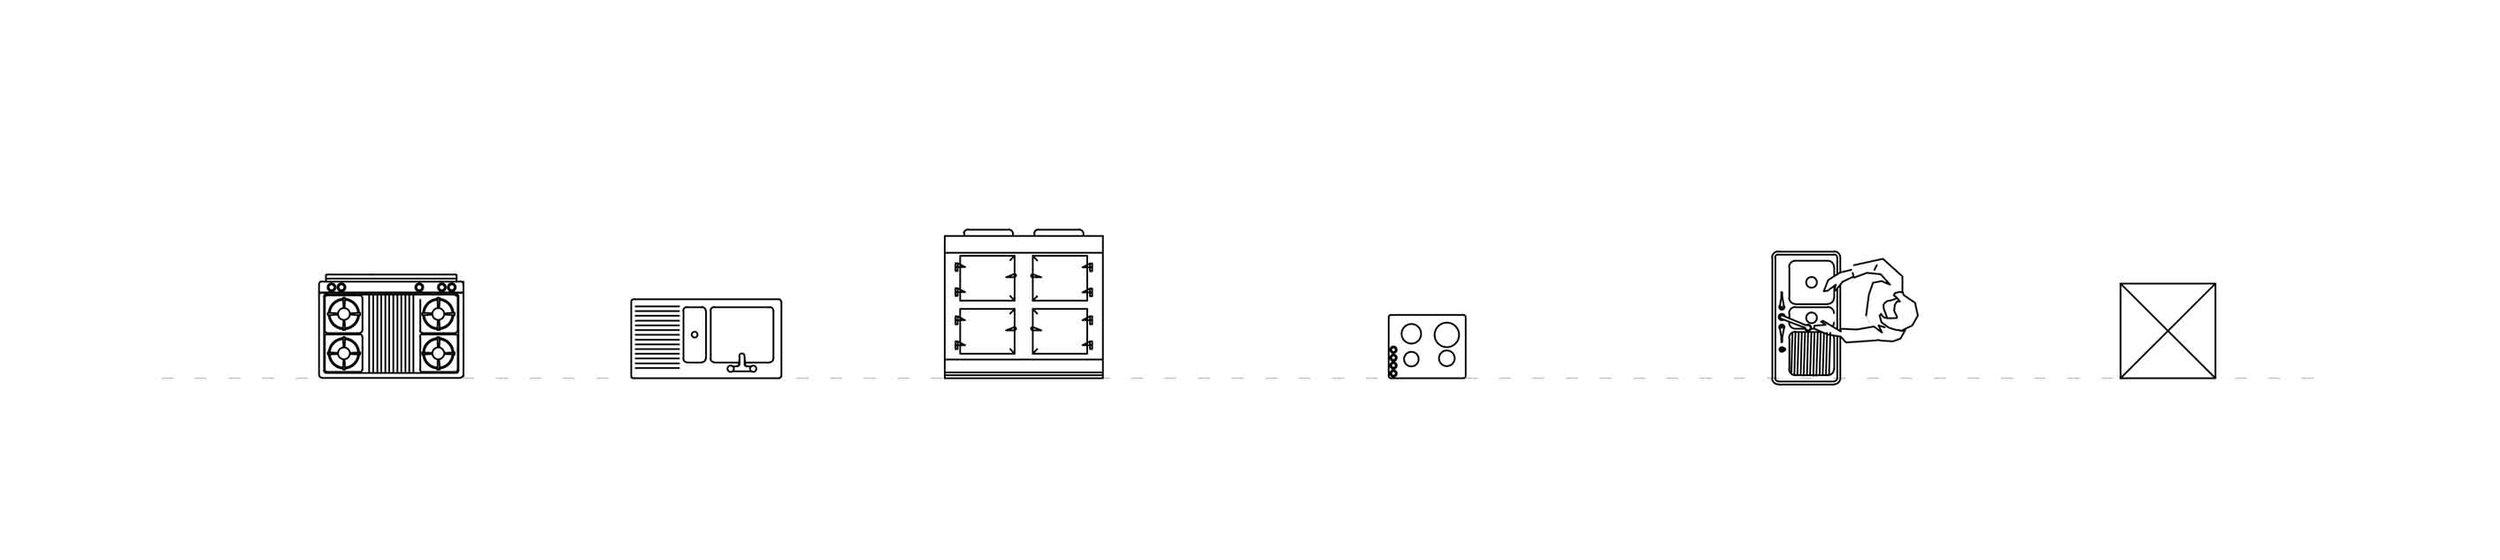 Free_CAD_Kitchen_Blocks.jpg